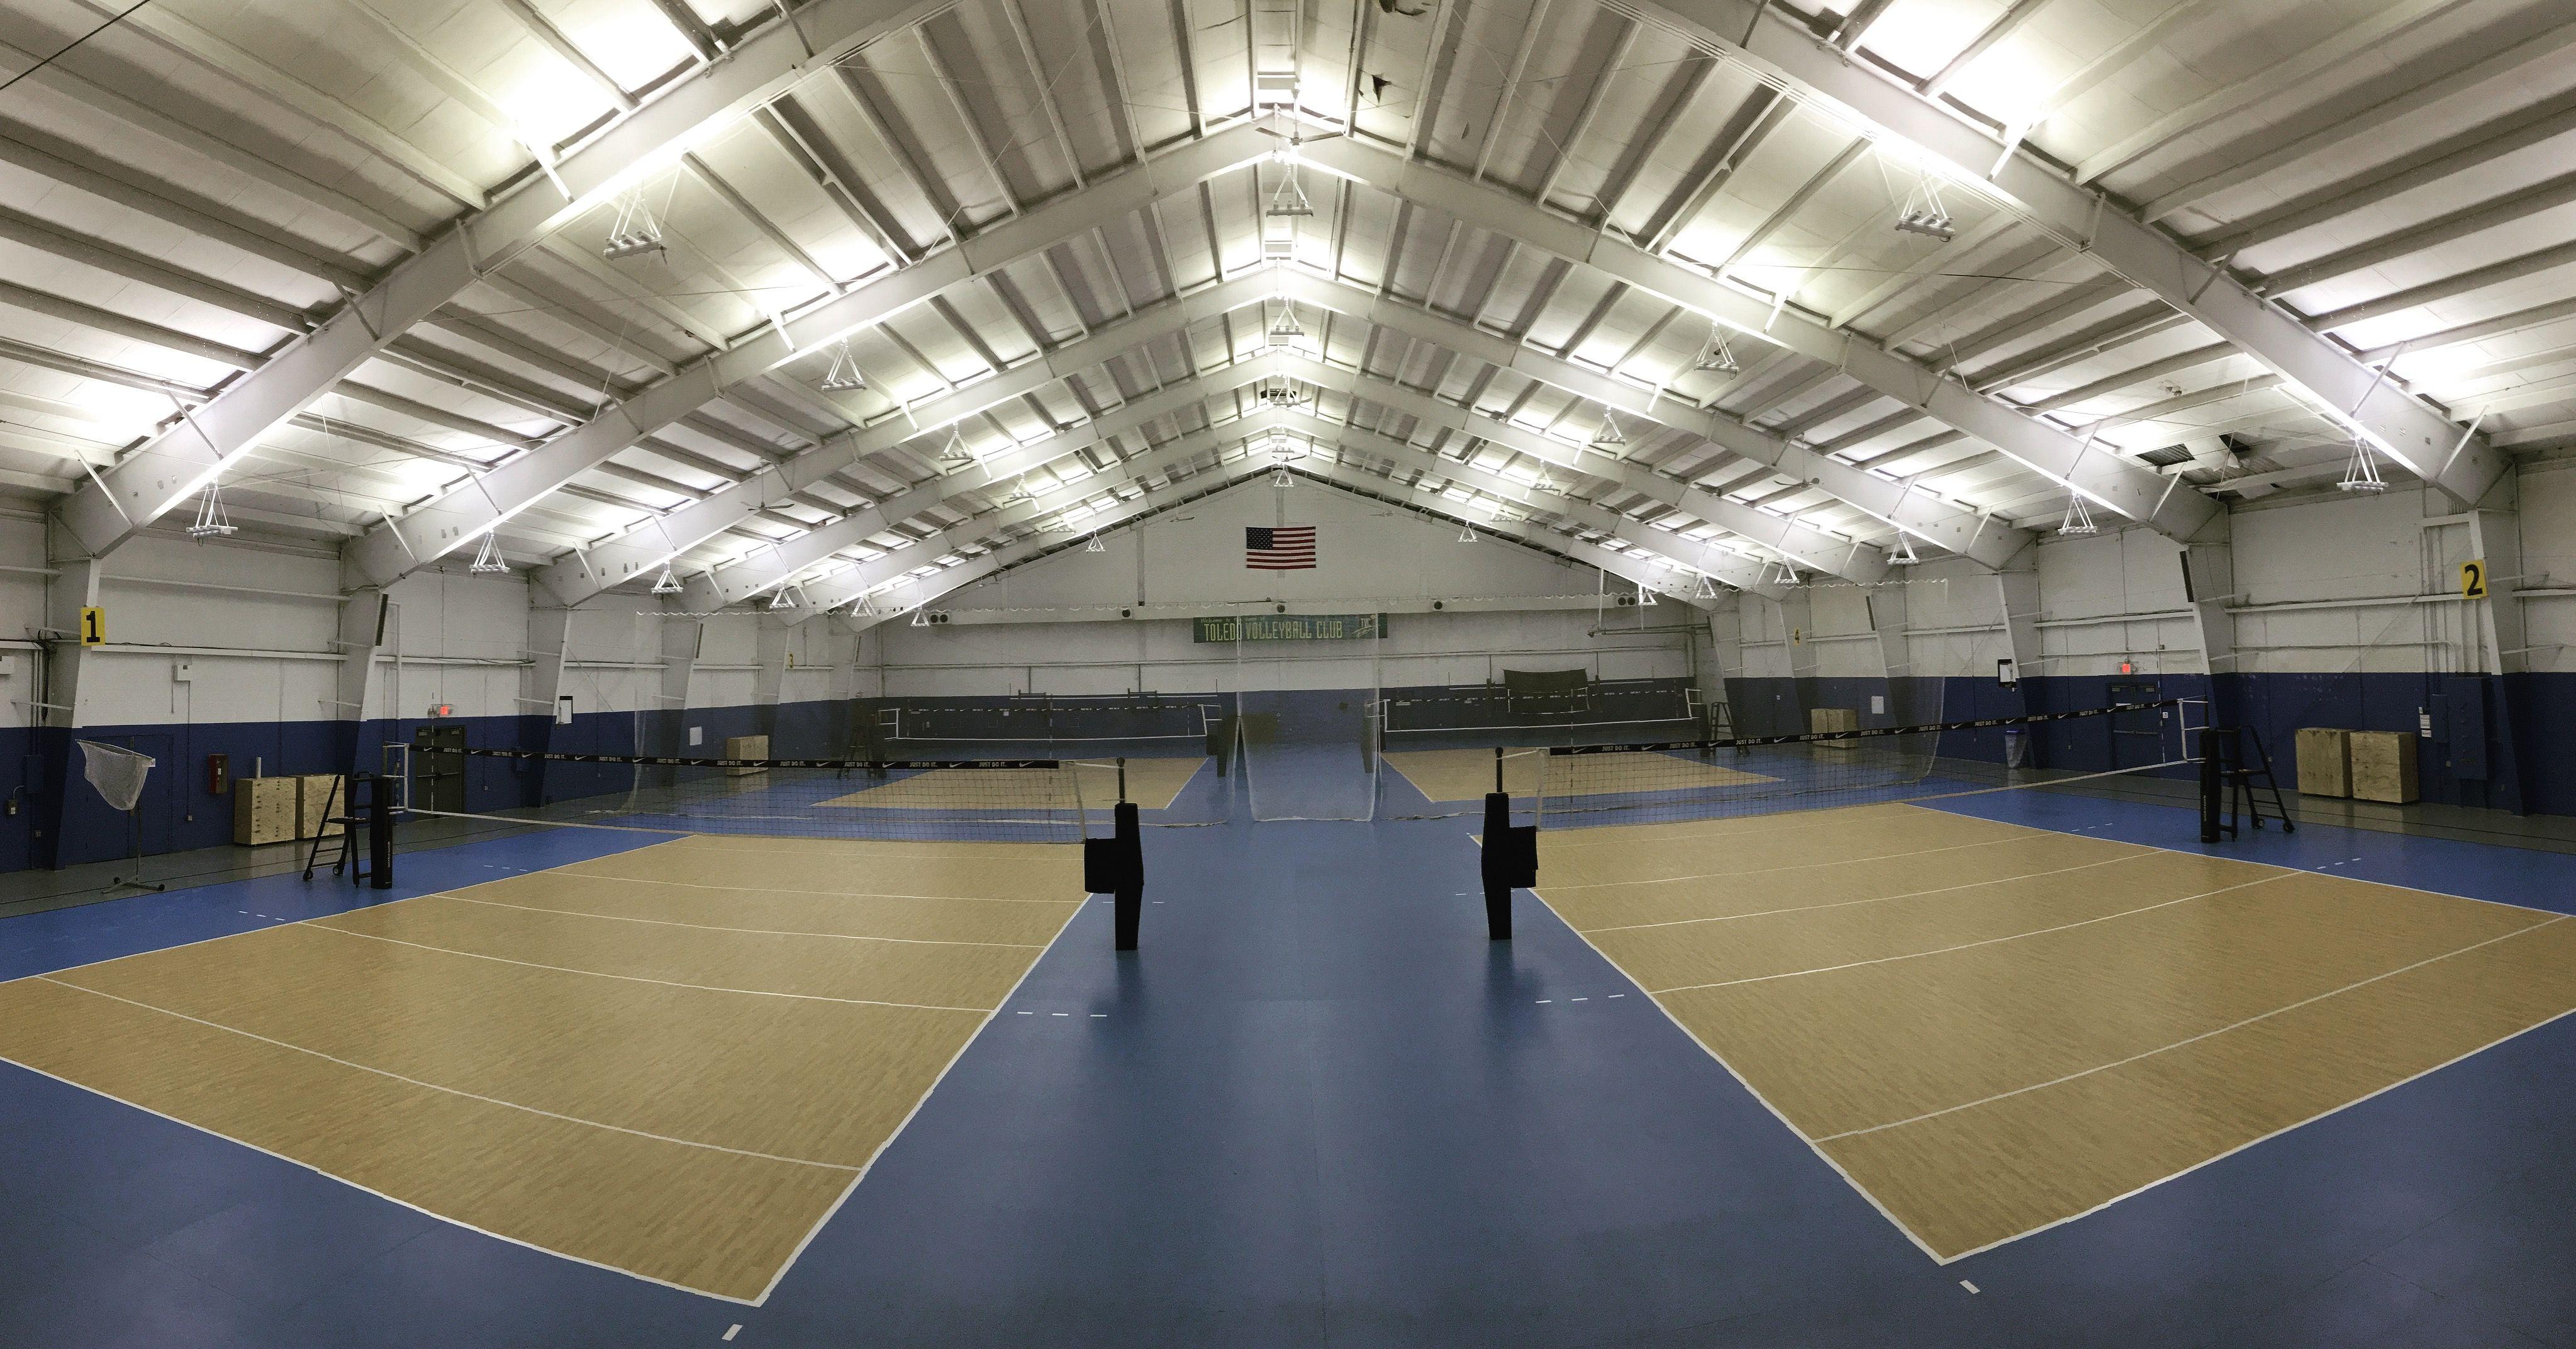 Toledo Volleyball Club In Ohio Outdoor Volleyball Net Volleyball Net Volleyball